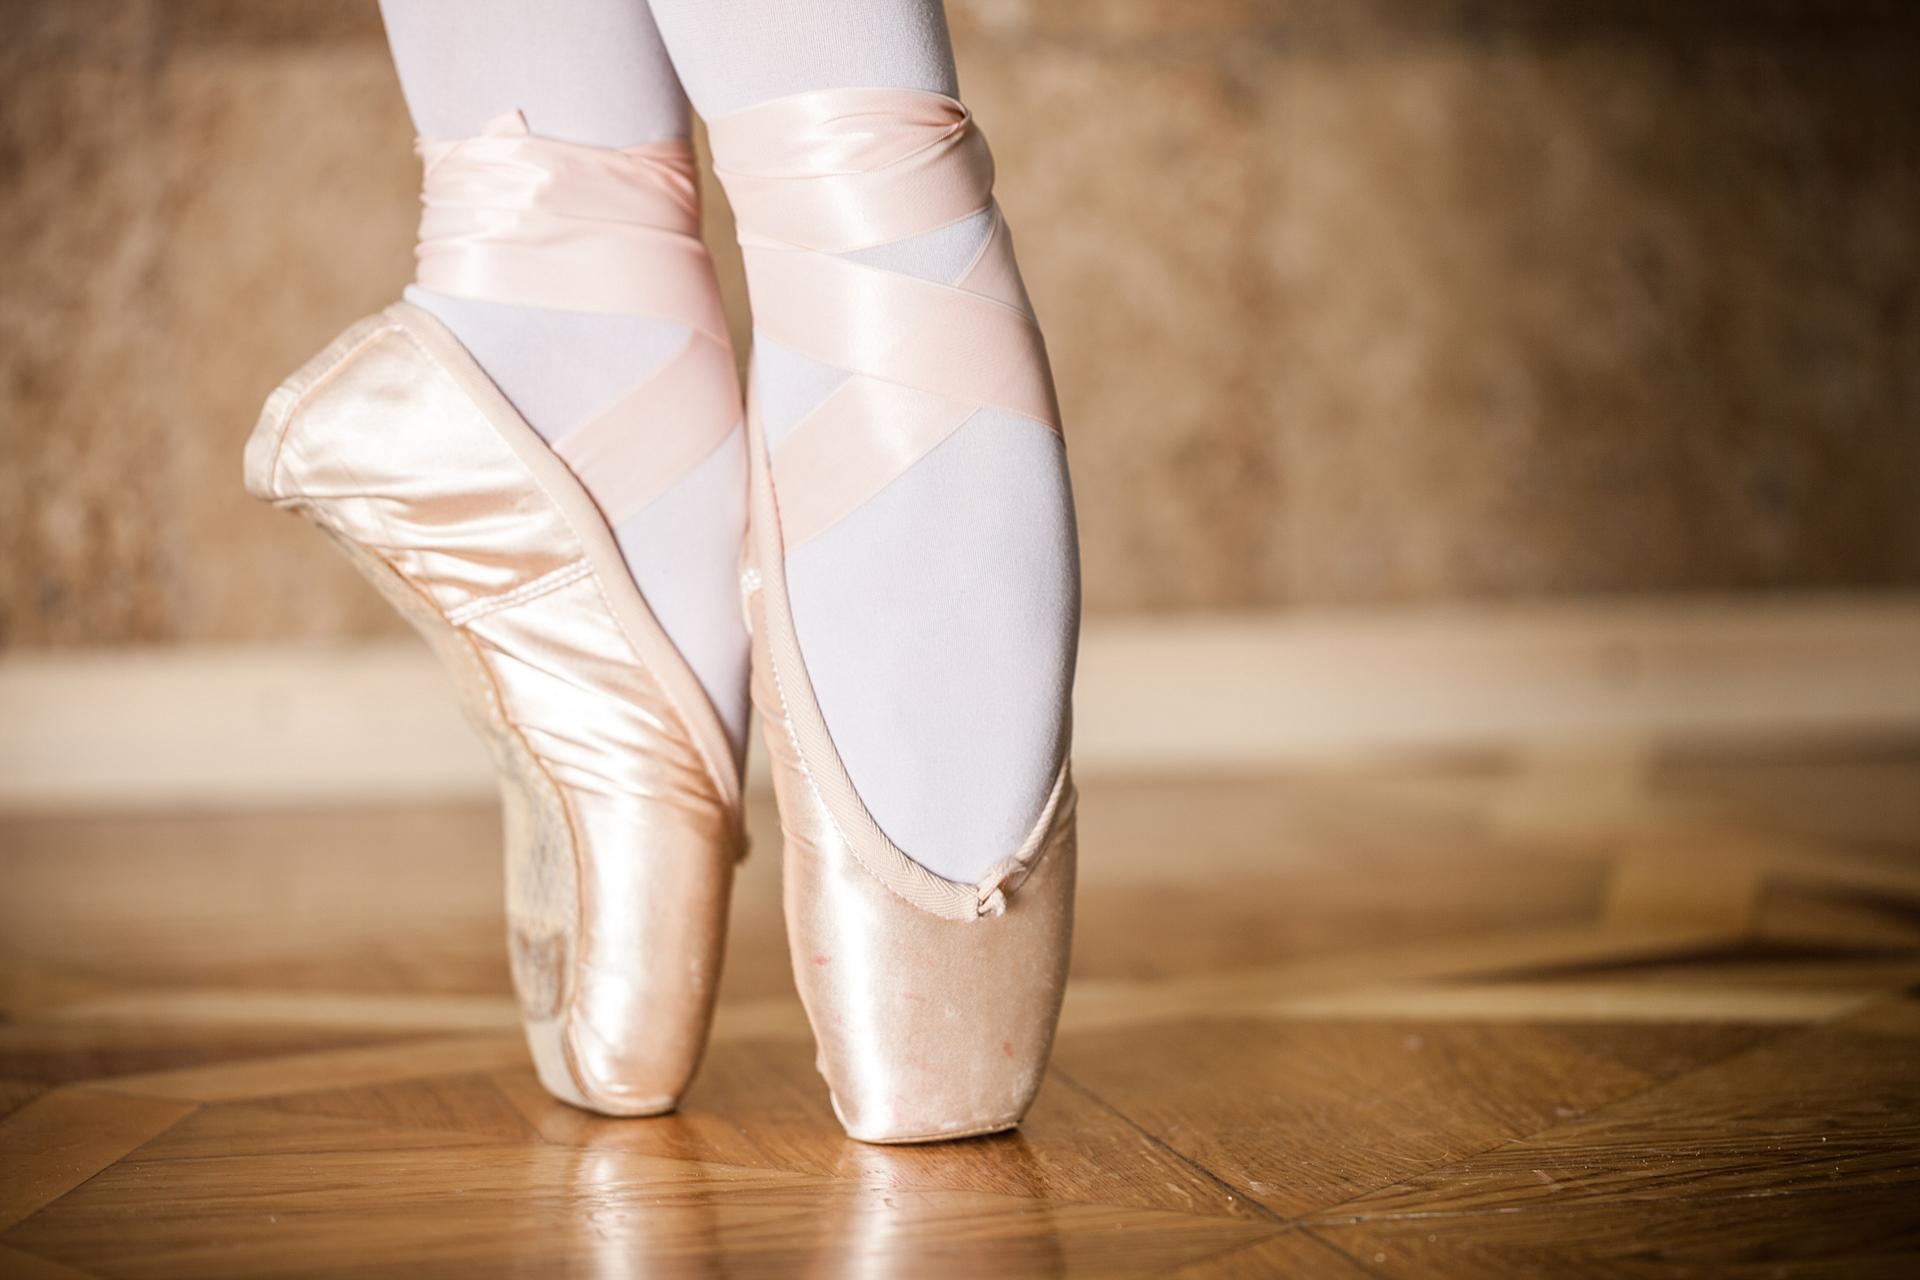 meet the dancers get on pointe health